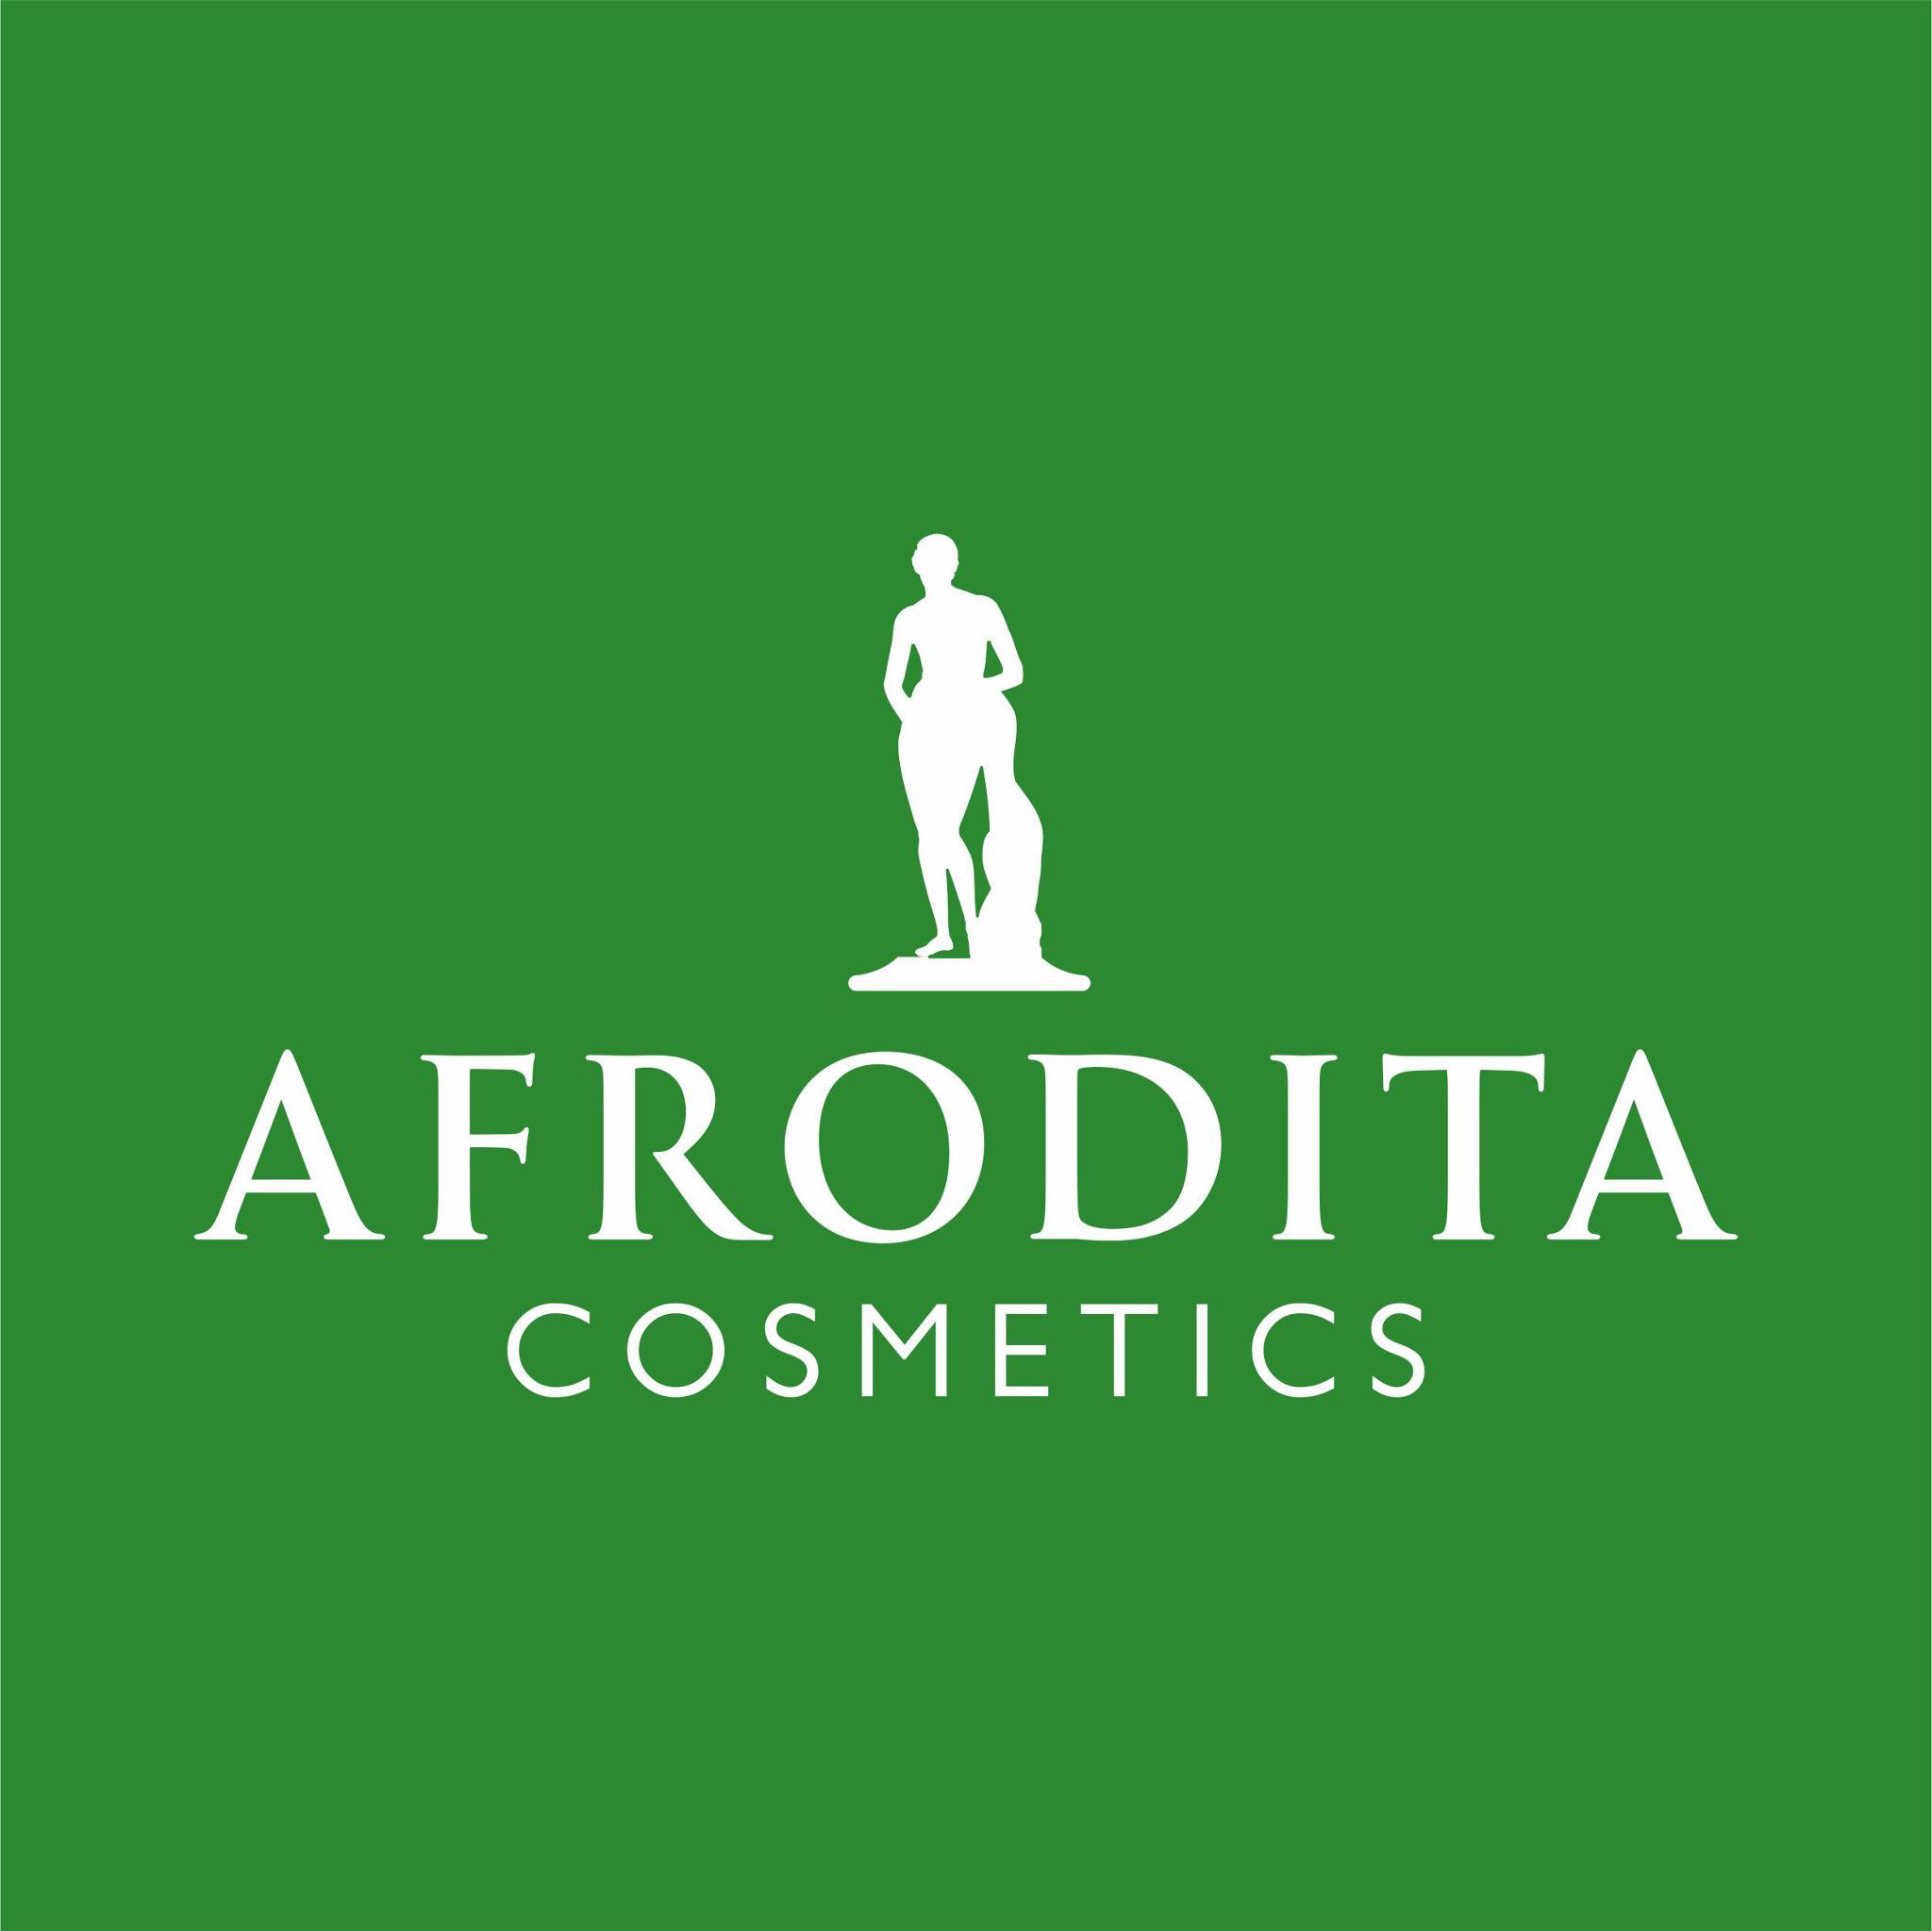 Afrodita_Cosmetics